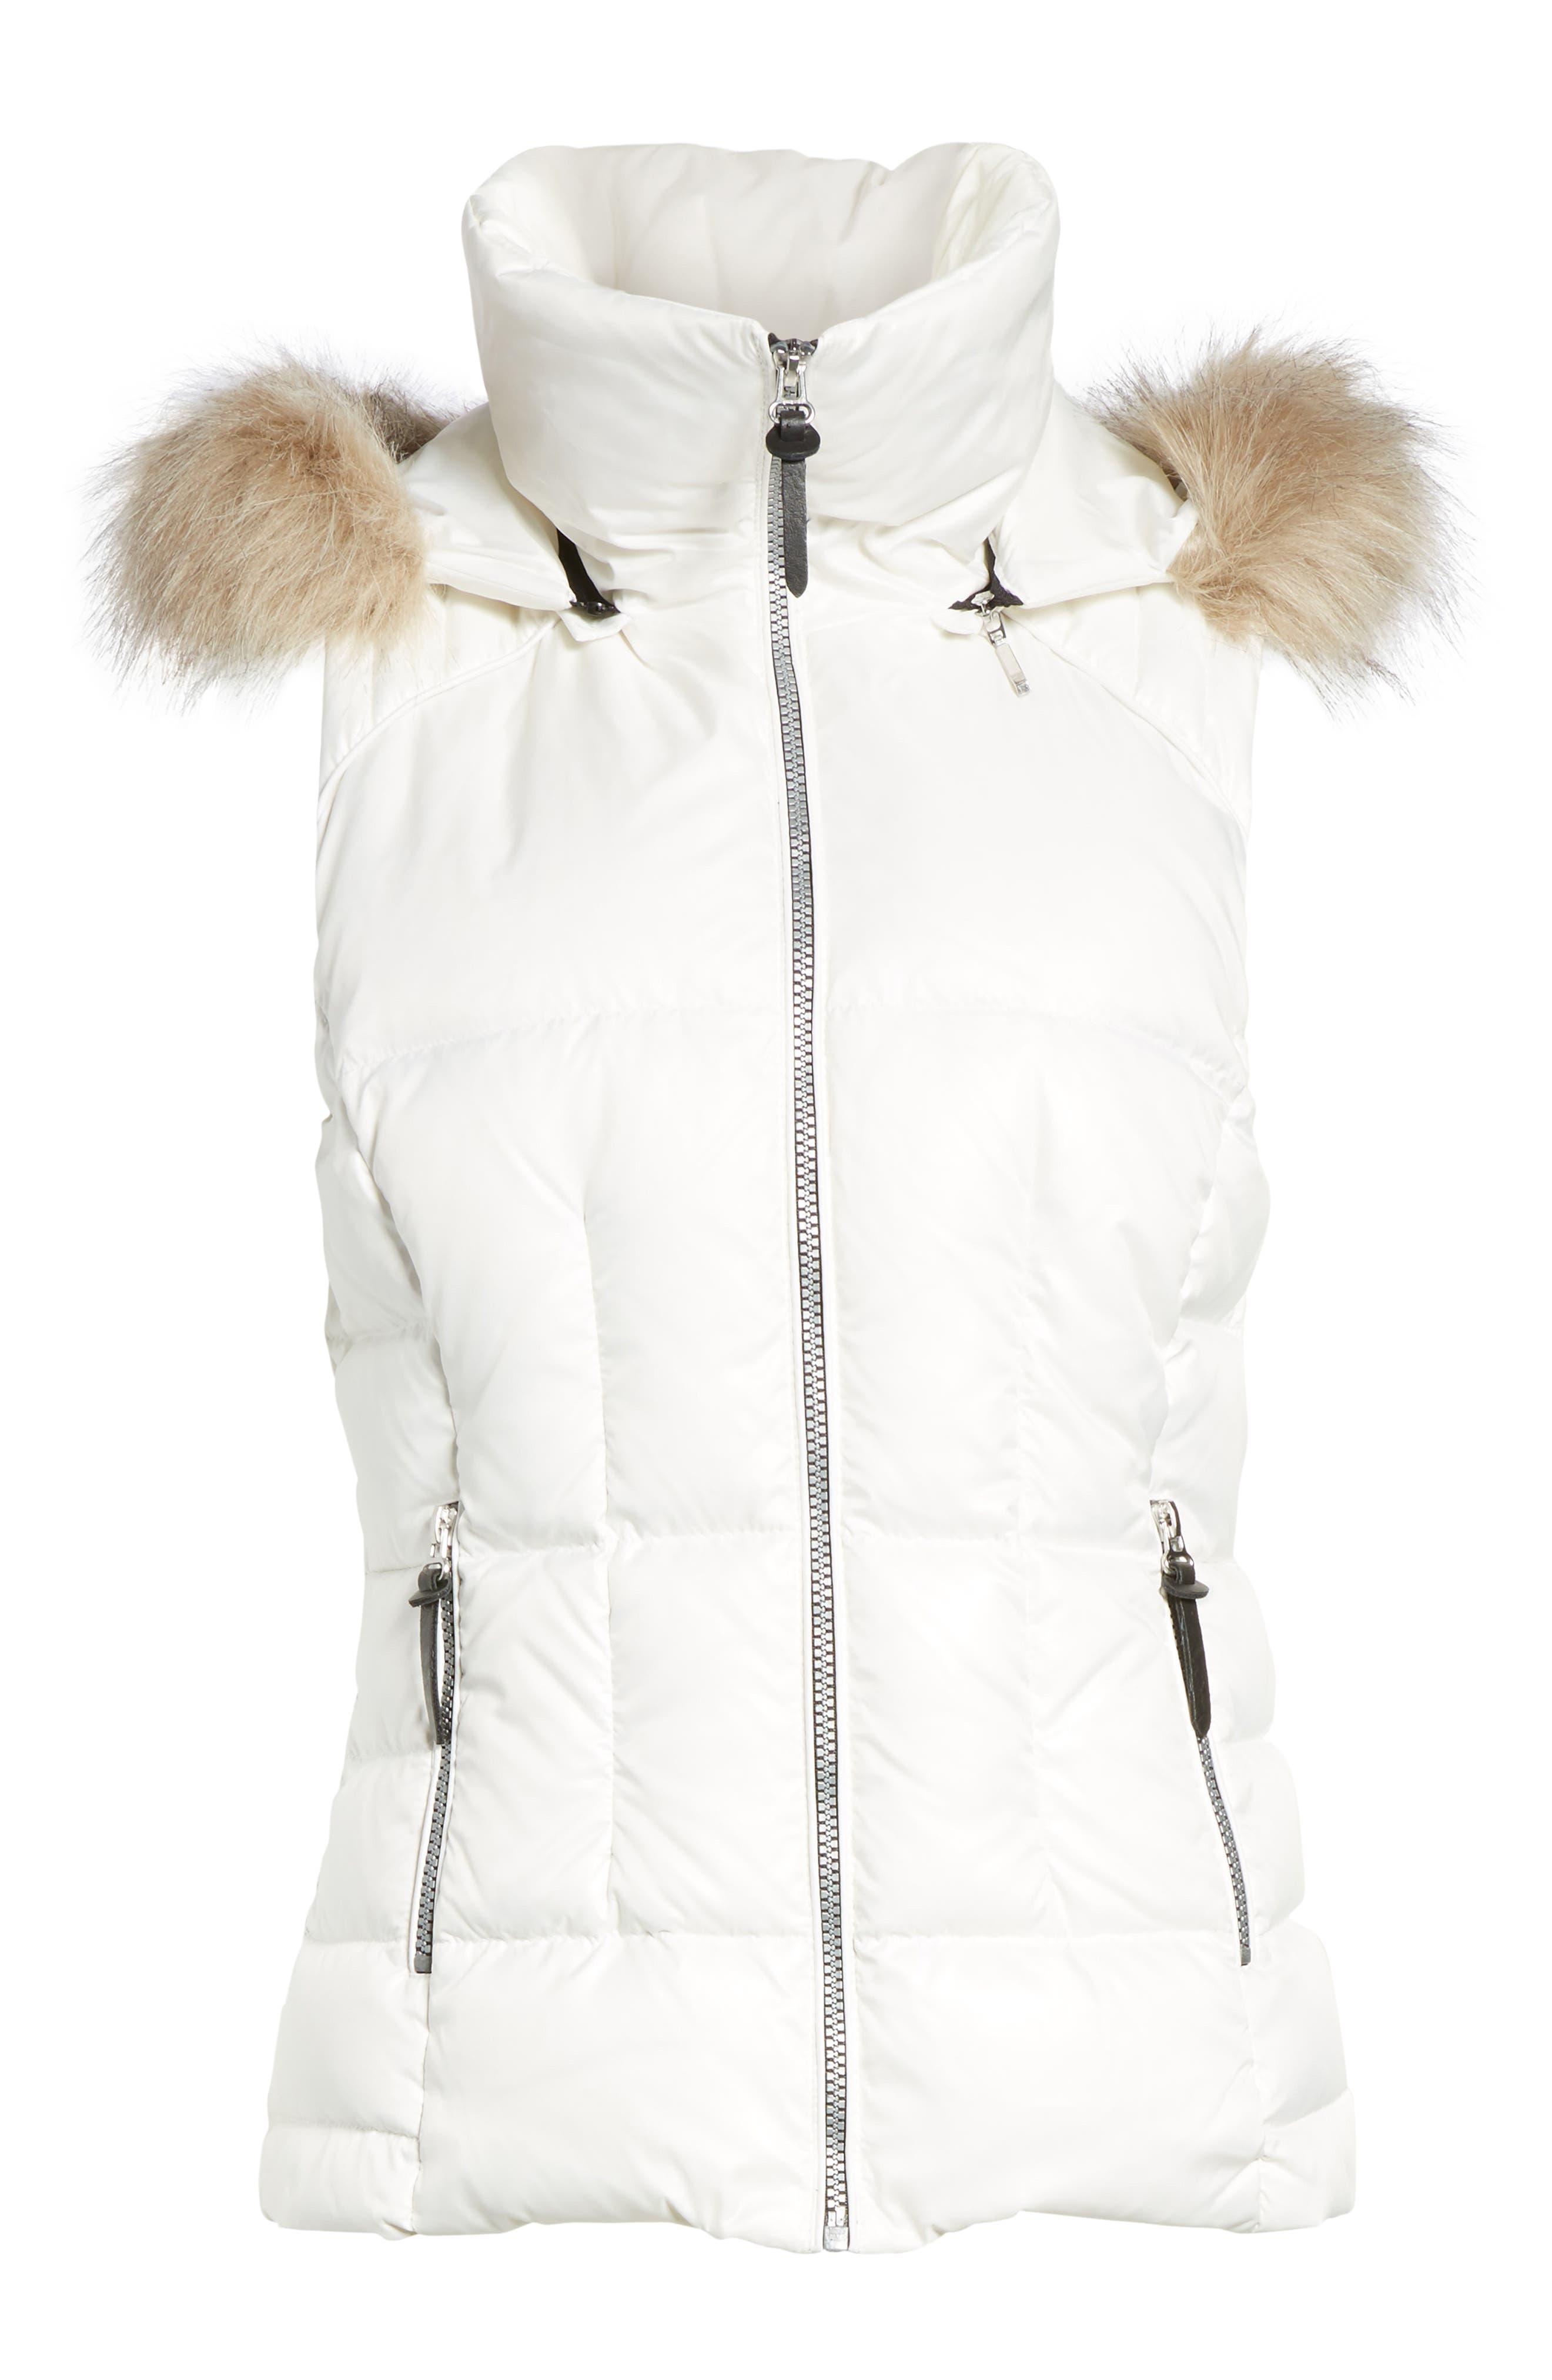 Lanie Puffer Vest with Faux Fur,                             Alternate thumbnail 5, color,                             100